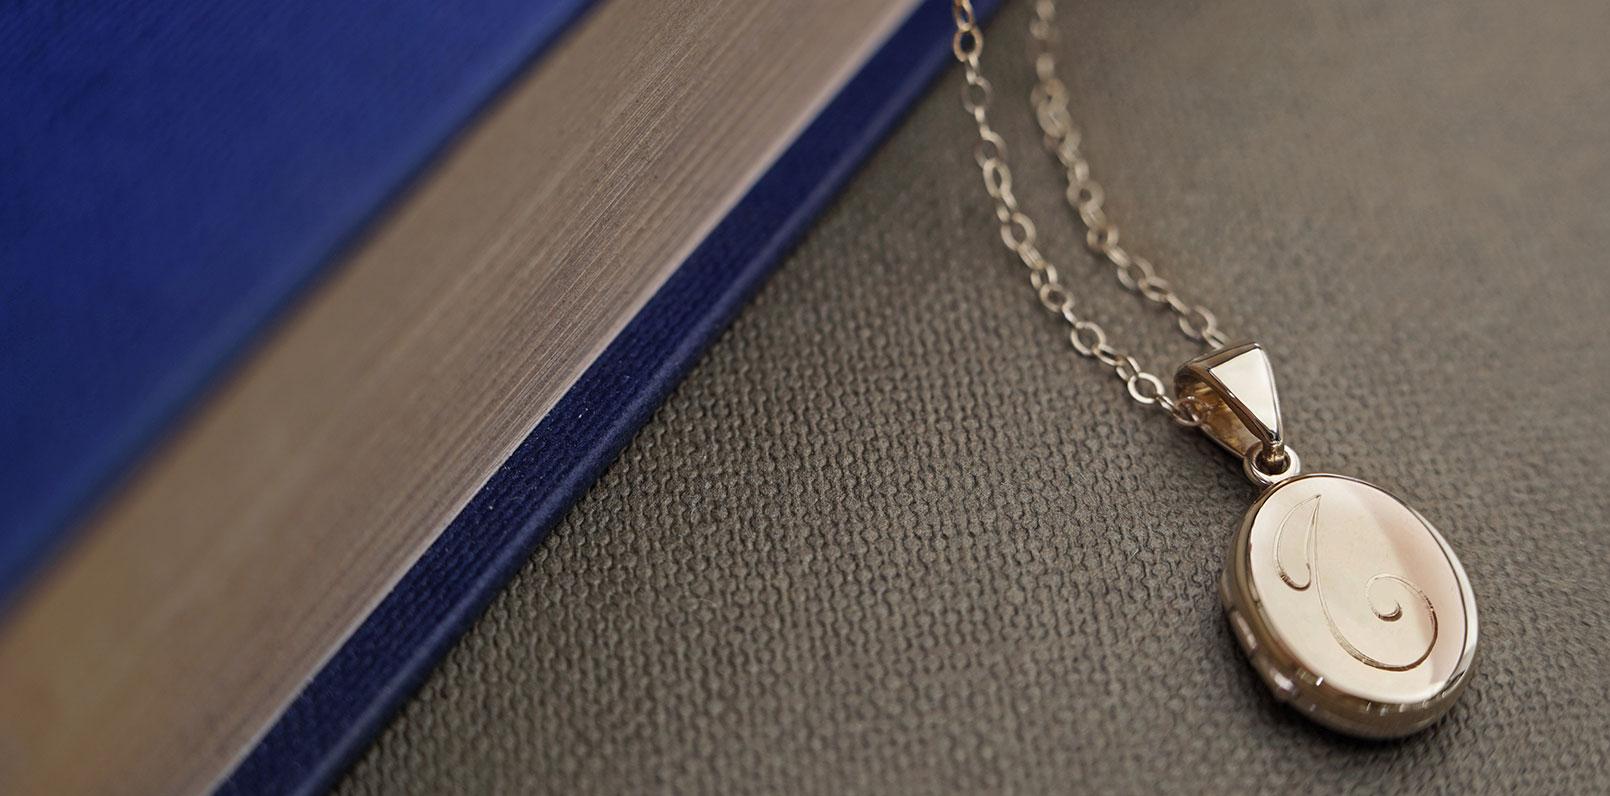 harriet-kelsall-bespoke-jewellery-engraved-pendant[1].jpg